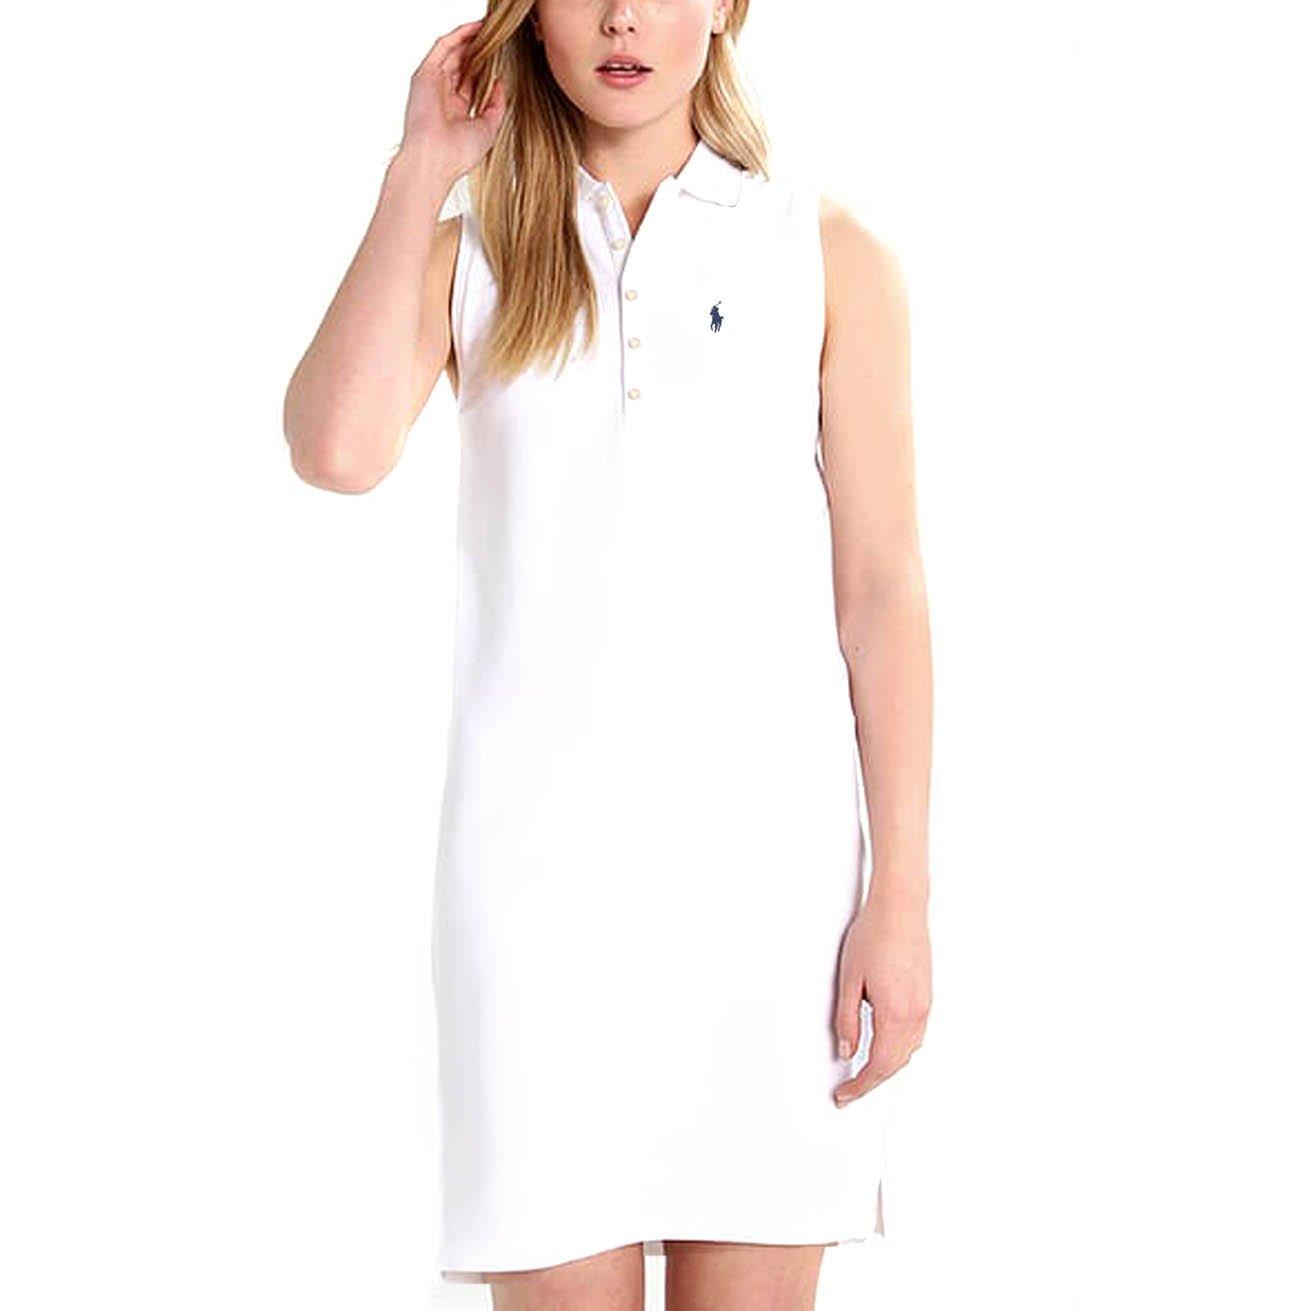 12b0470cef Ralph Lauren New Genuine Womens Stretch Mesh Polo Dress - White ...